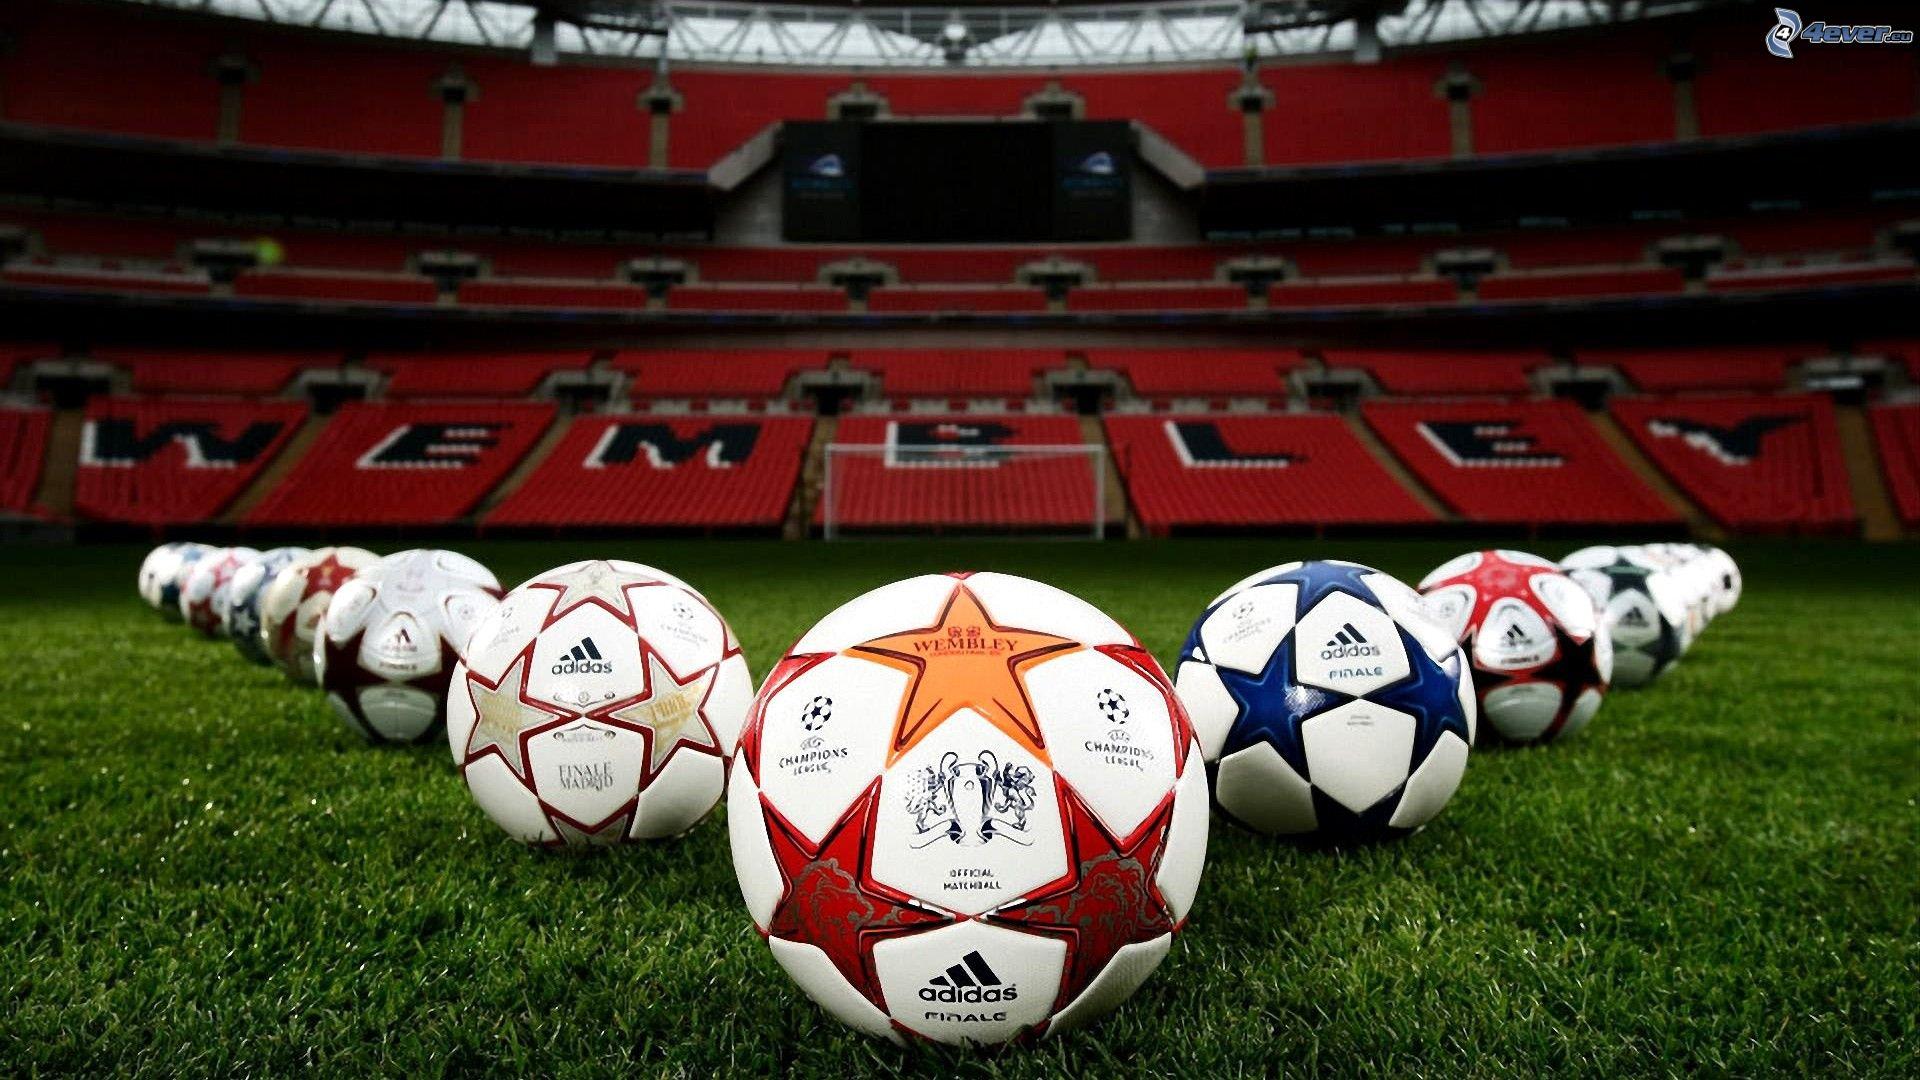 Streaming Fiorentina-Lazio e Milan-Juventus  gratis: diretta partite oggi posticipi serie A